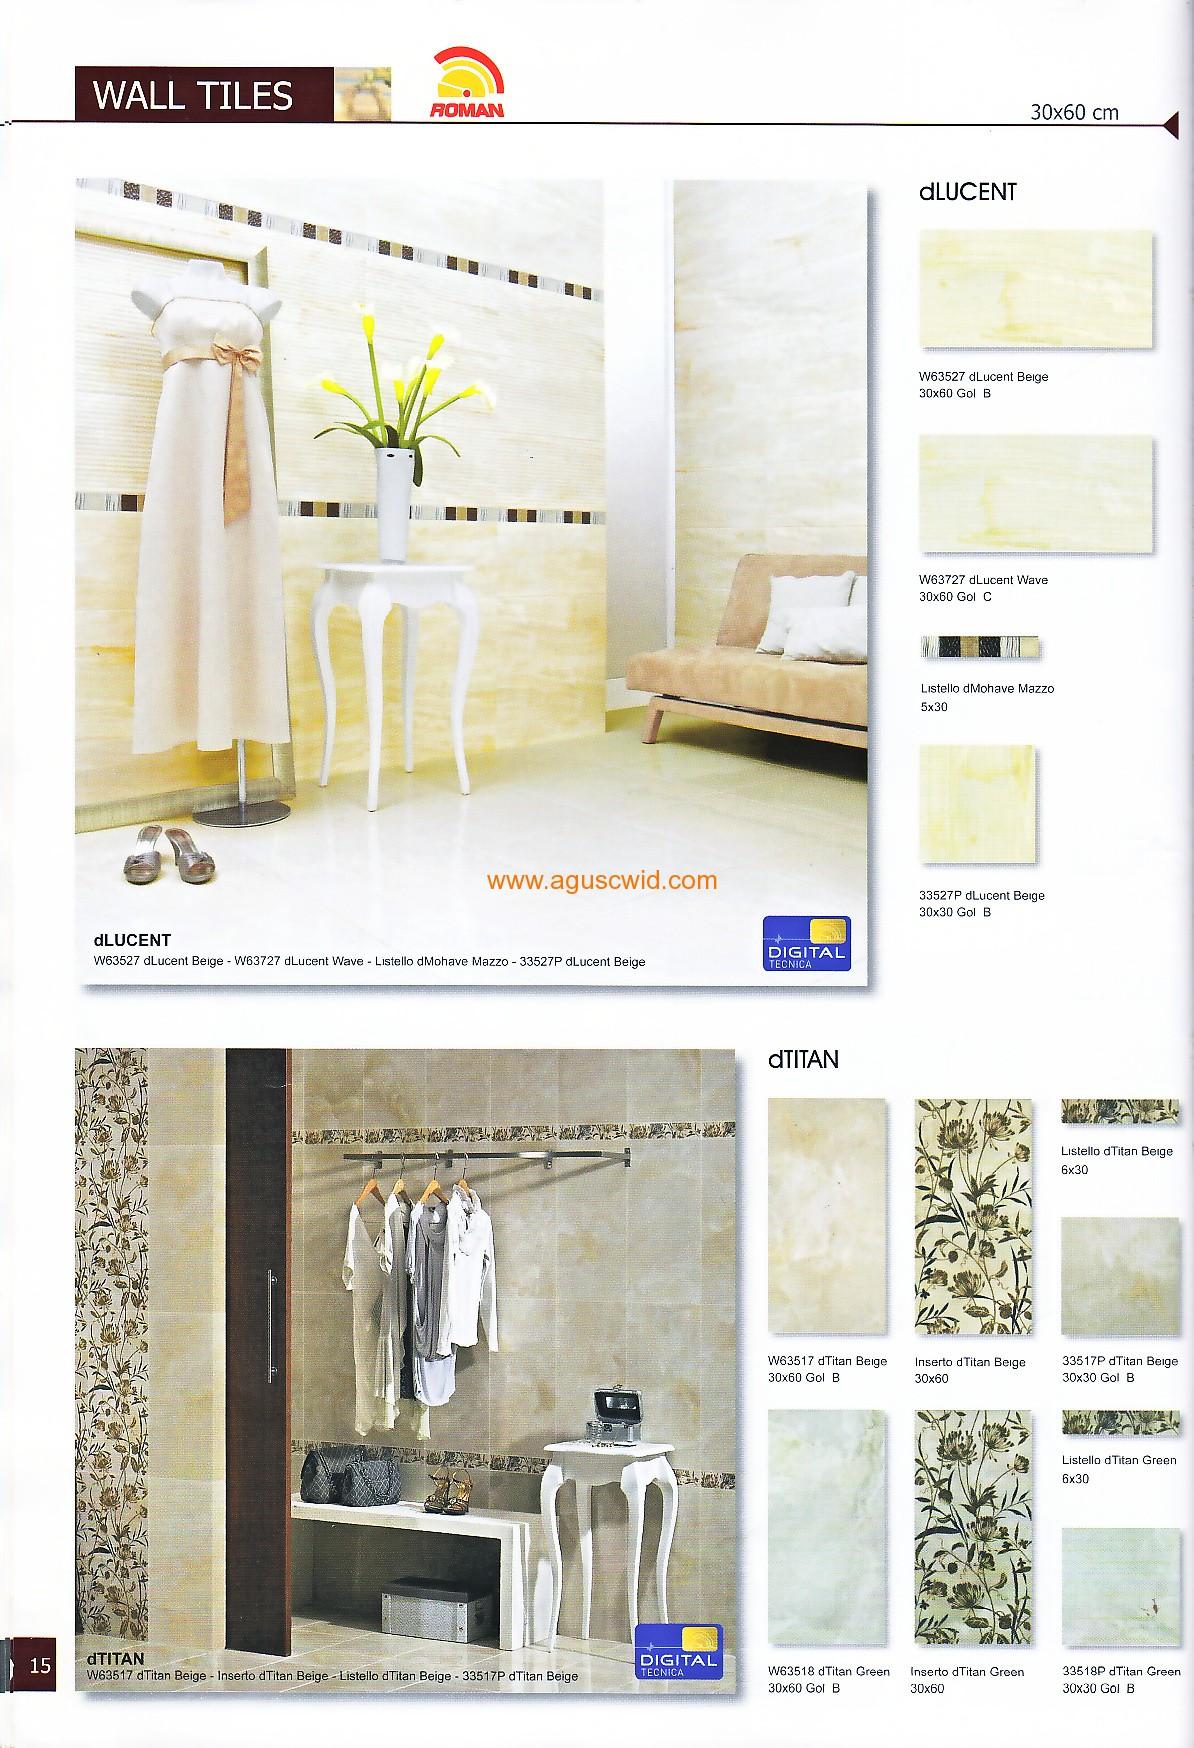 ... & Pemilik Katalog : http://www.romanceramics.com/roman/index.php